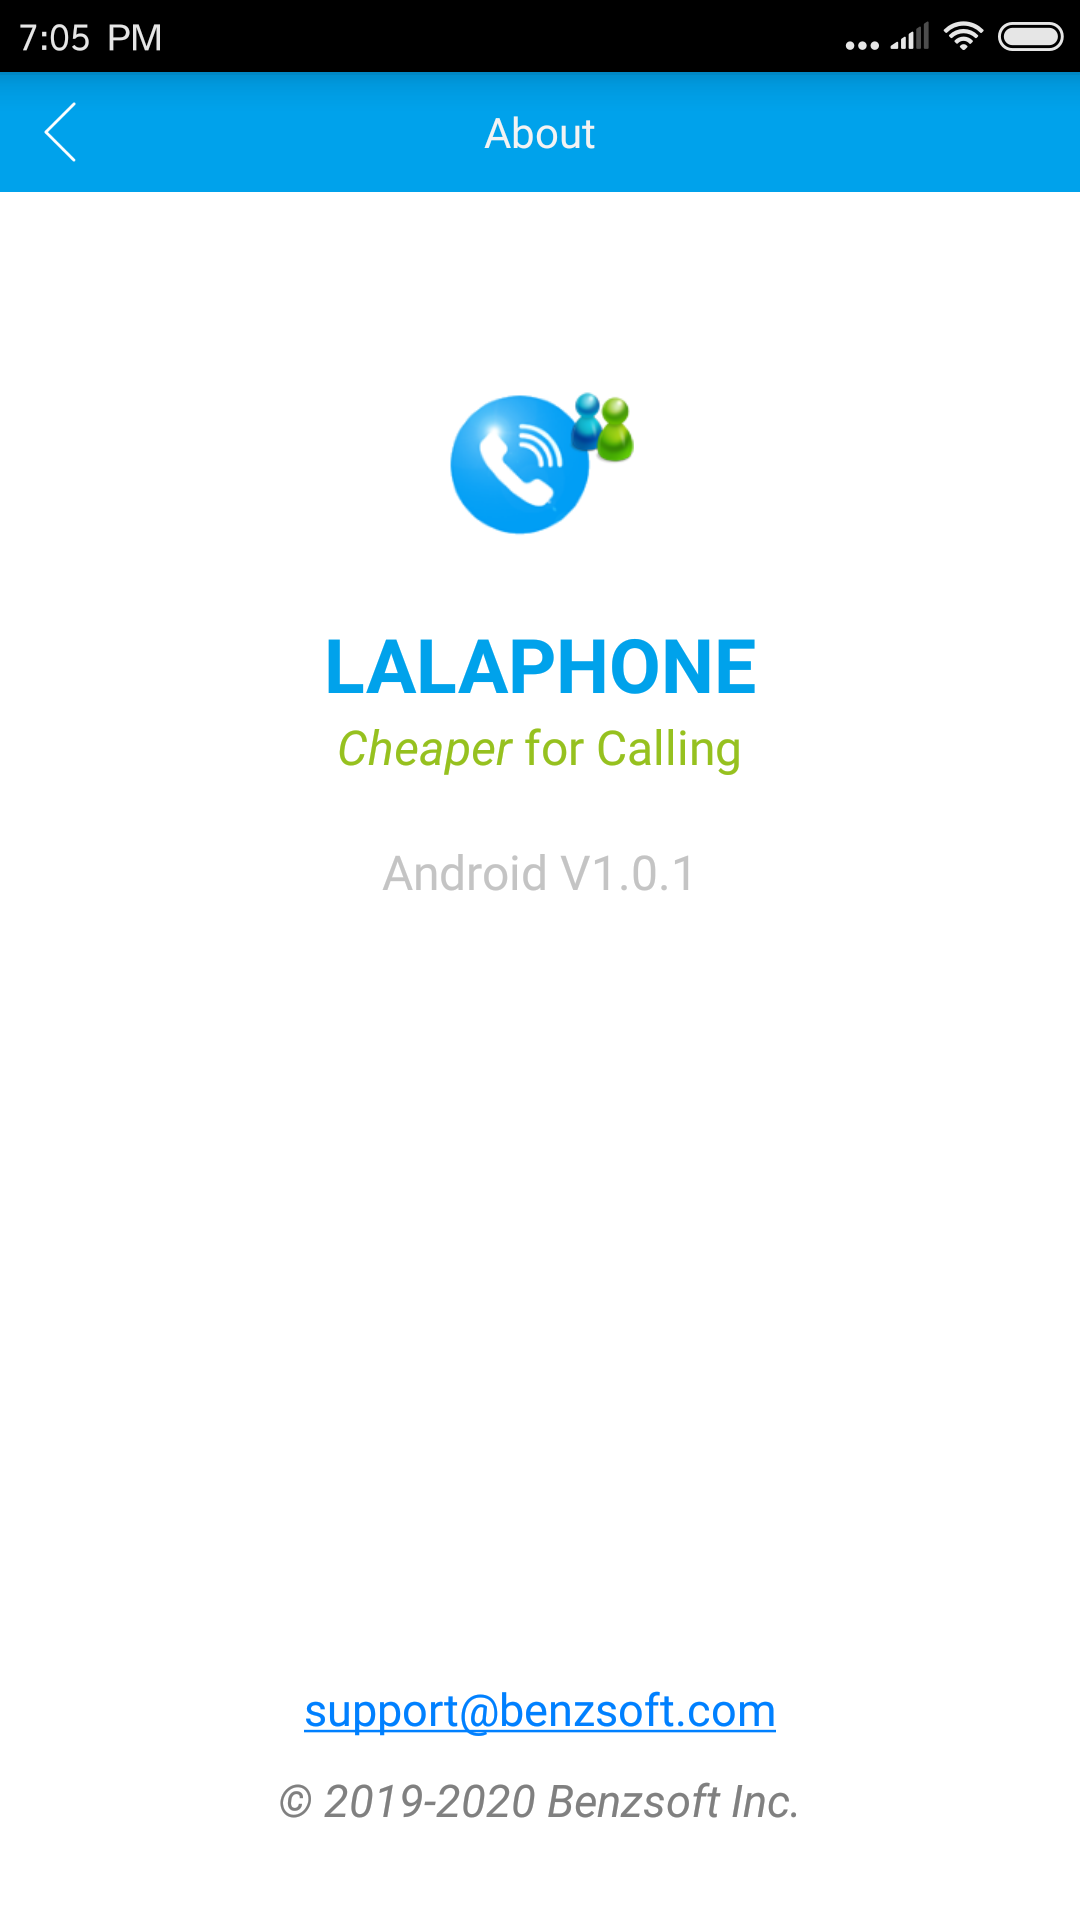 LalaPhone